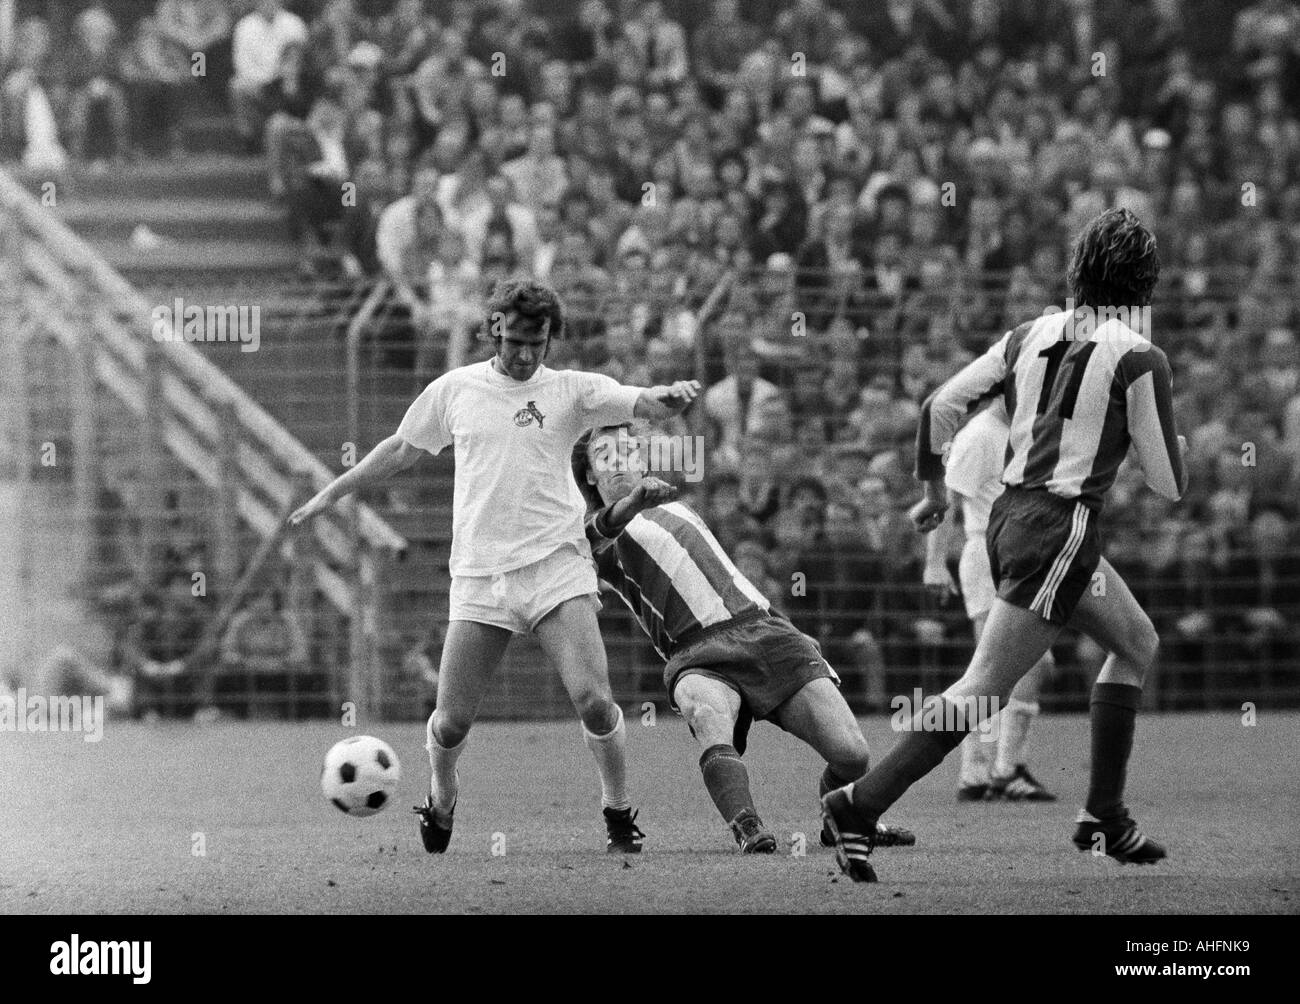 football, Bundesliga, 1971/1972, Stadium Radrennbahn near the Muengersdorfer Stadium in Cologne, 1. FC Cologne versus FC Bayern Munich 1:4, scene of the match, duel between Wolfgang Overath (Koeln) left and Rainer Zobel (FCB) - Stock Image